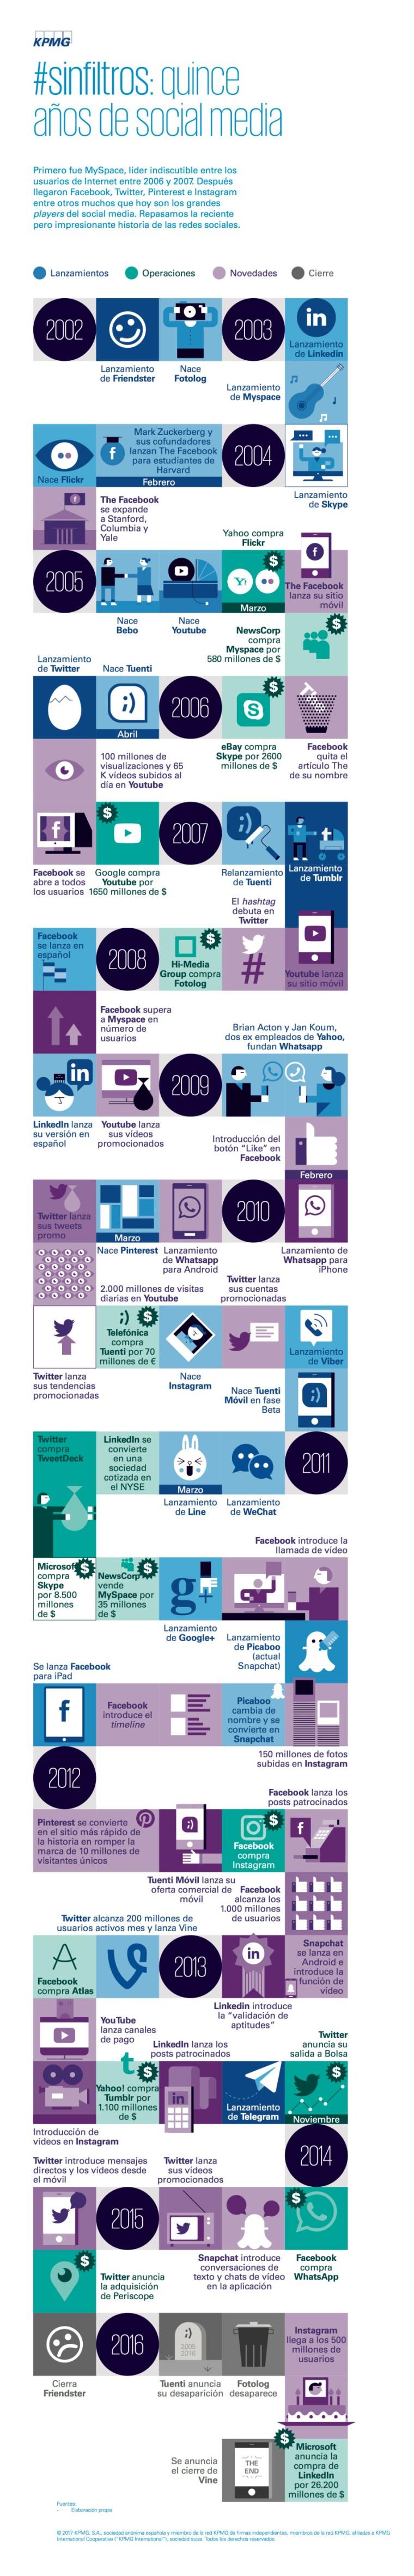 15-anos-de-redes-sociales-infografia.jpg